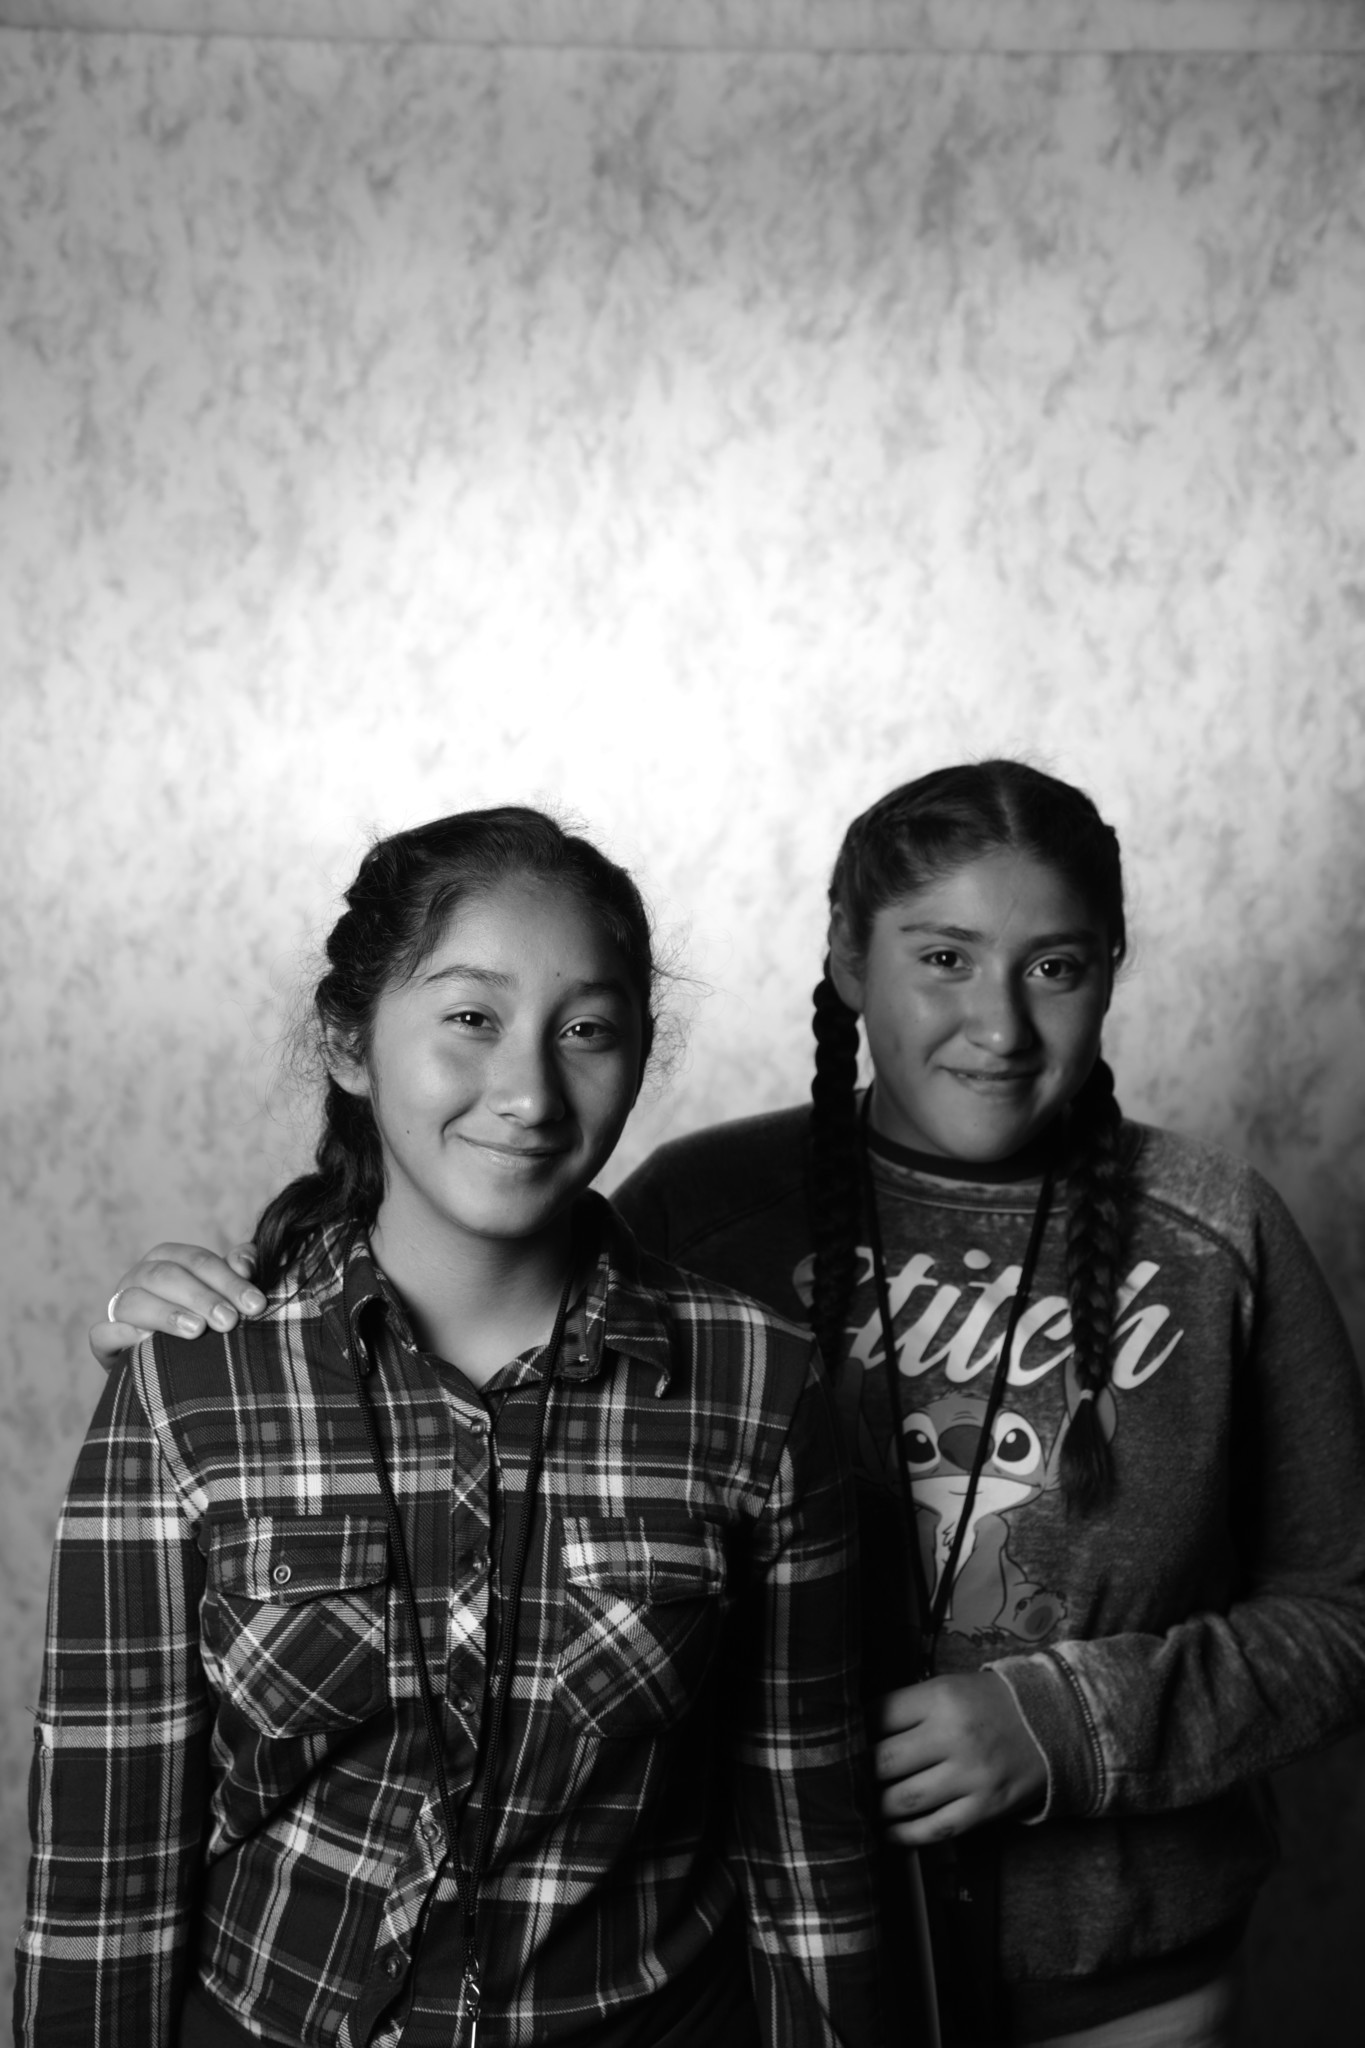 Twins Delilah and Joycelyn Medina